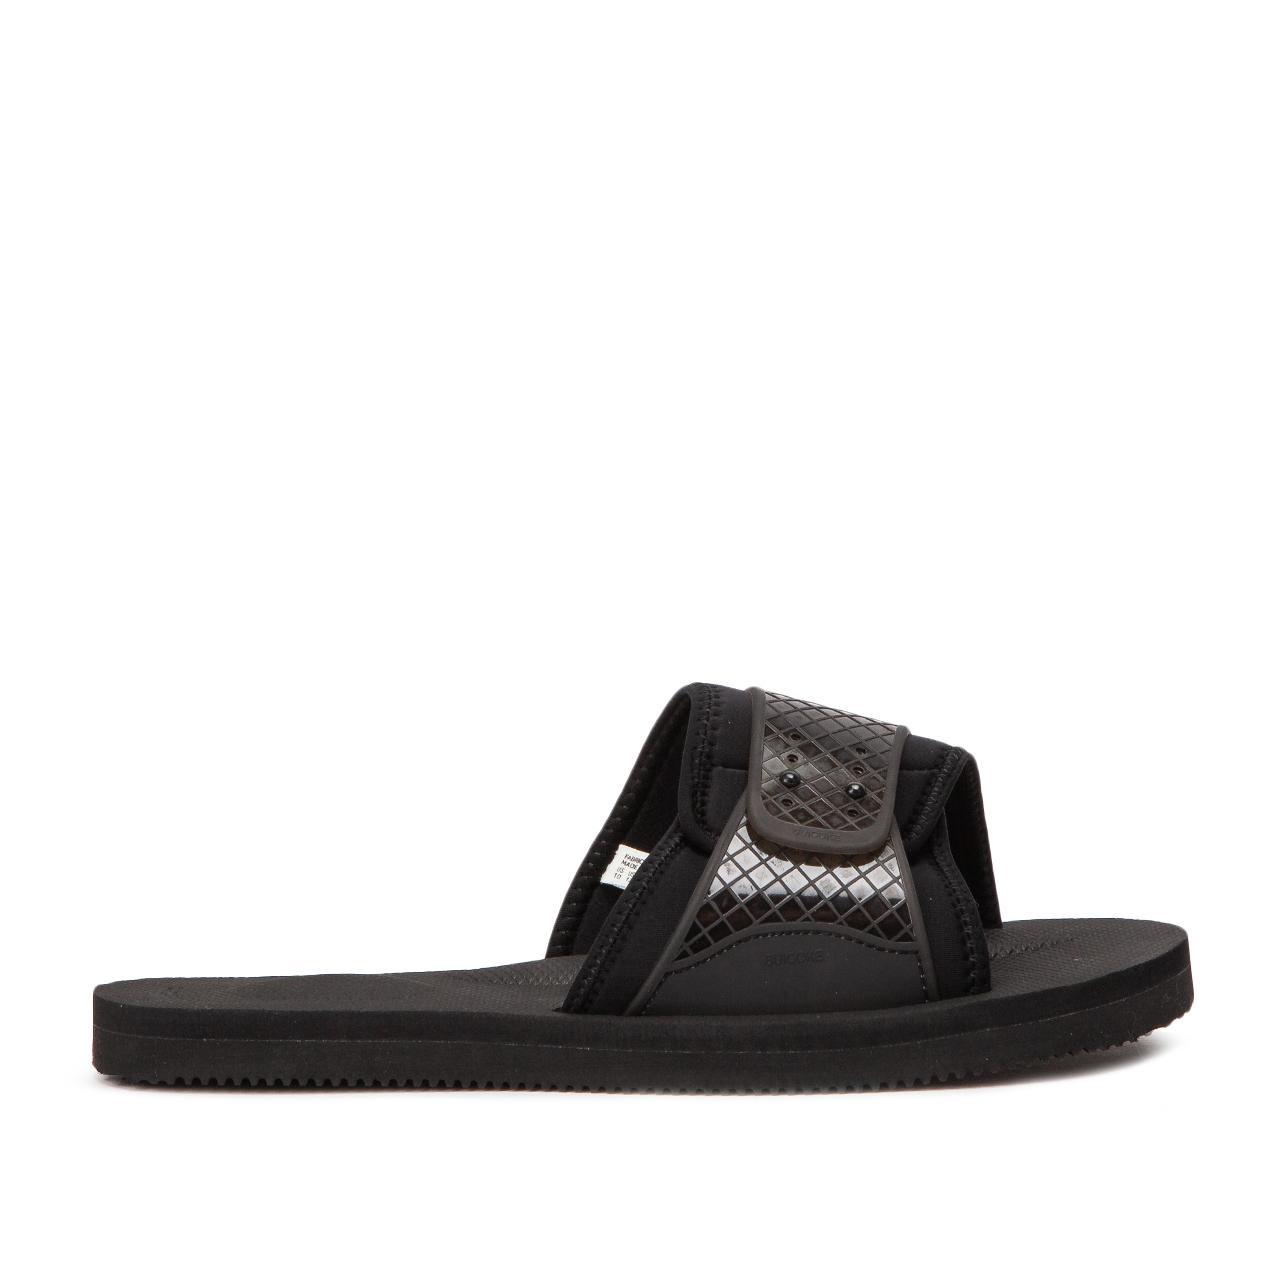 ce2f6ddd77ae Suicoke - Black Sandals Siv for Men - Lyst. View fullscreen